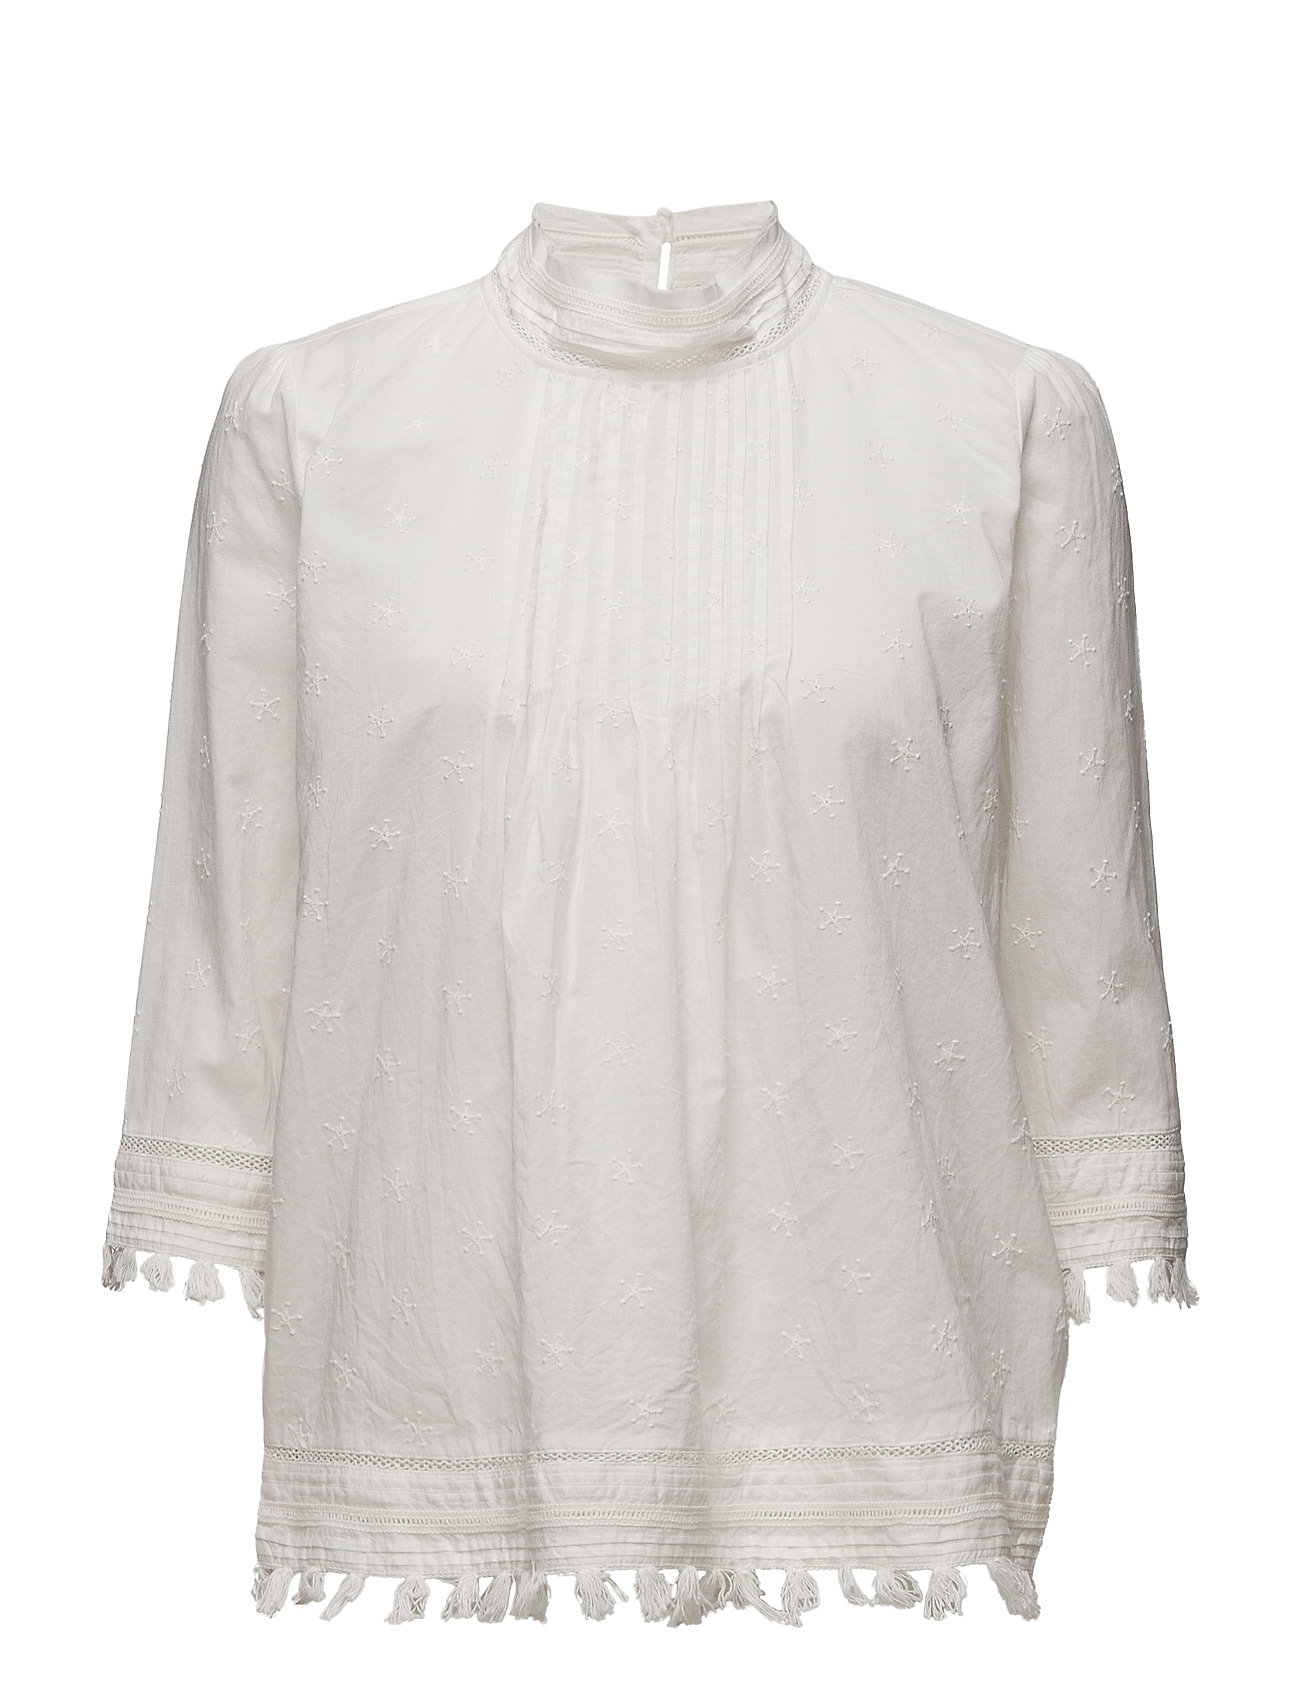 3/4 Sleeve Woven Top With Embroidered Star Allover Scotch & Soda Langærmede til Damer i Off White